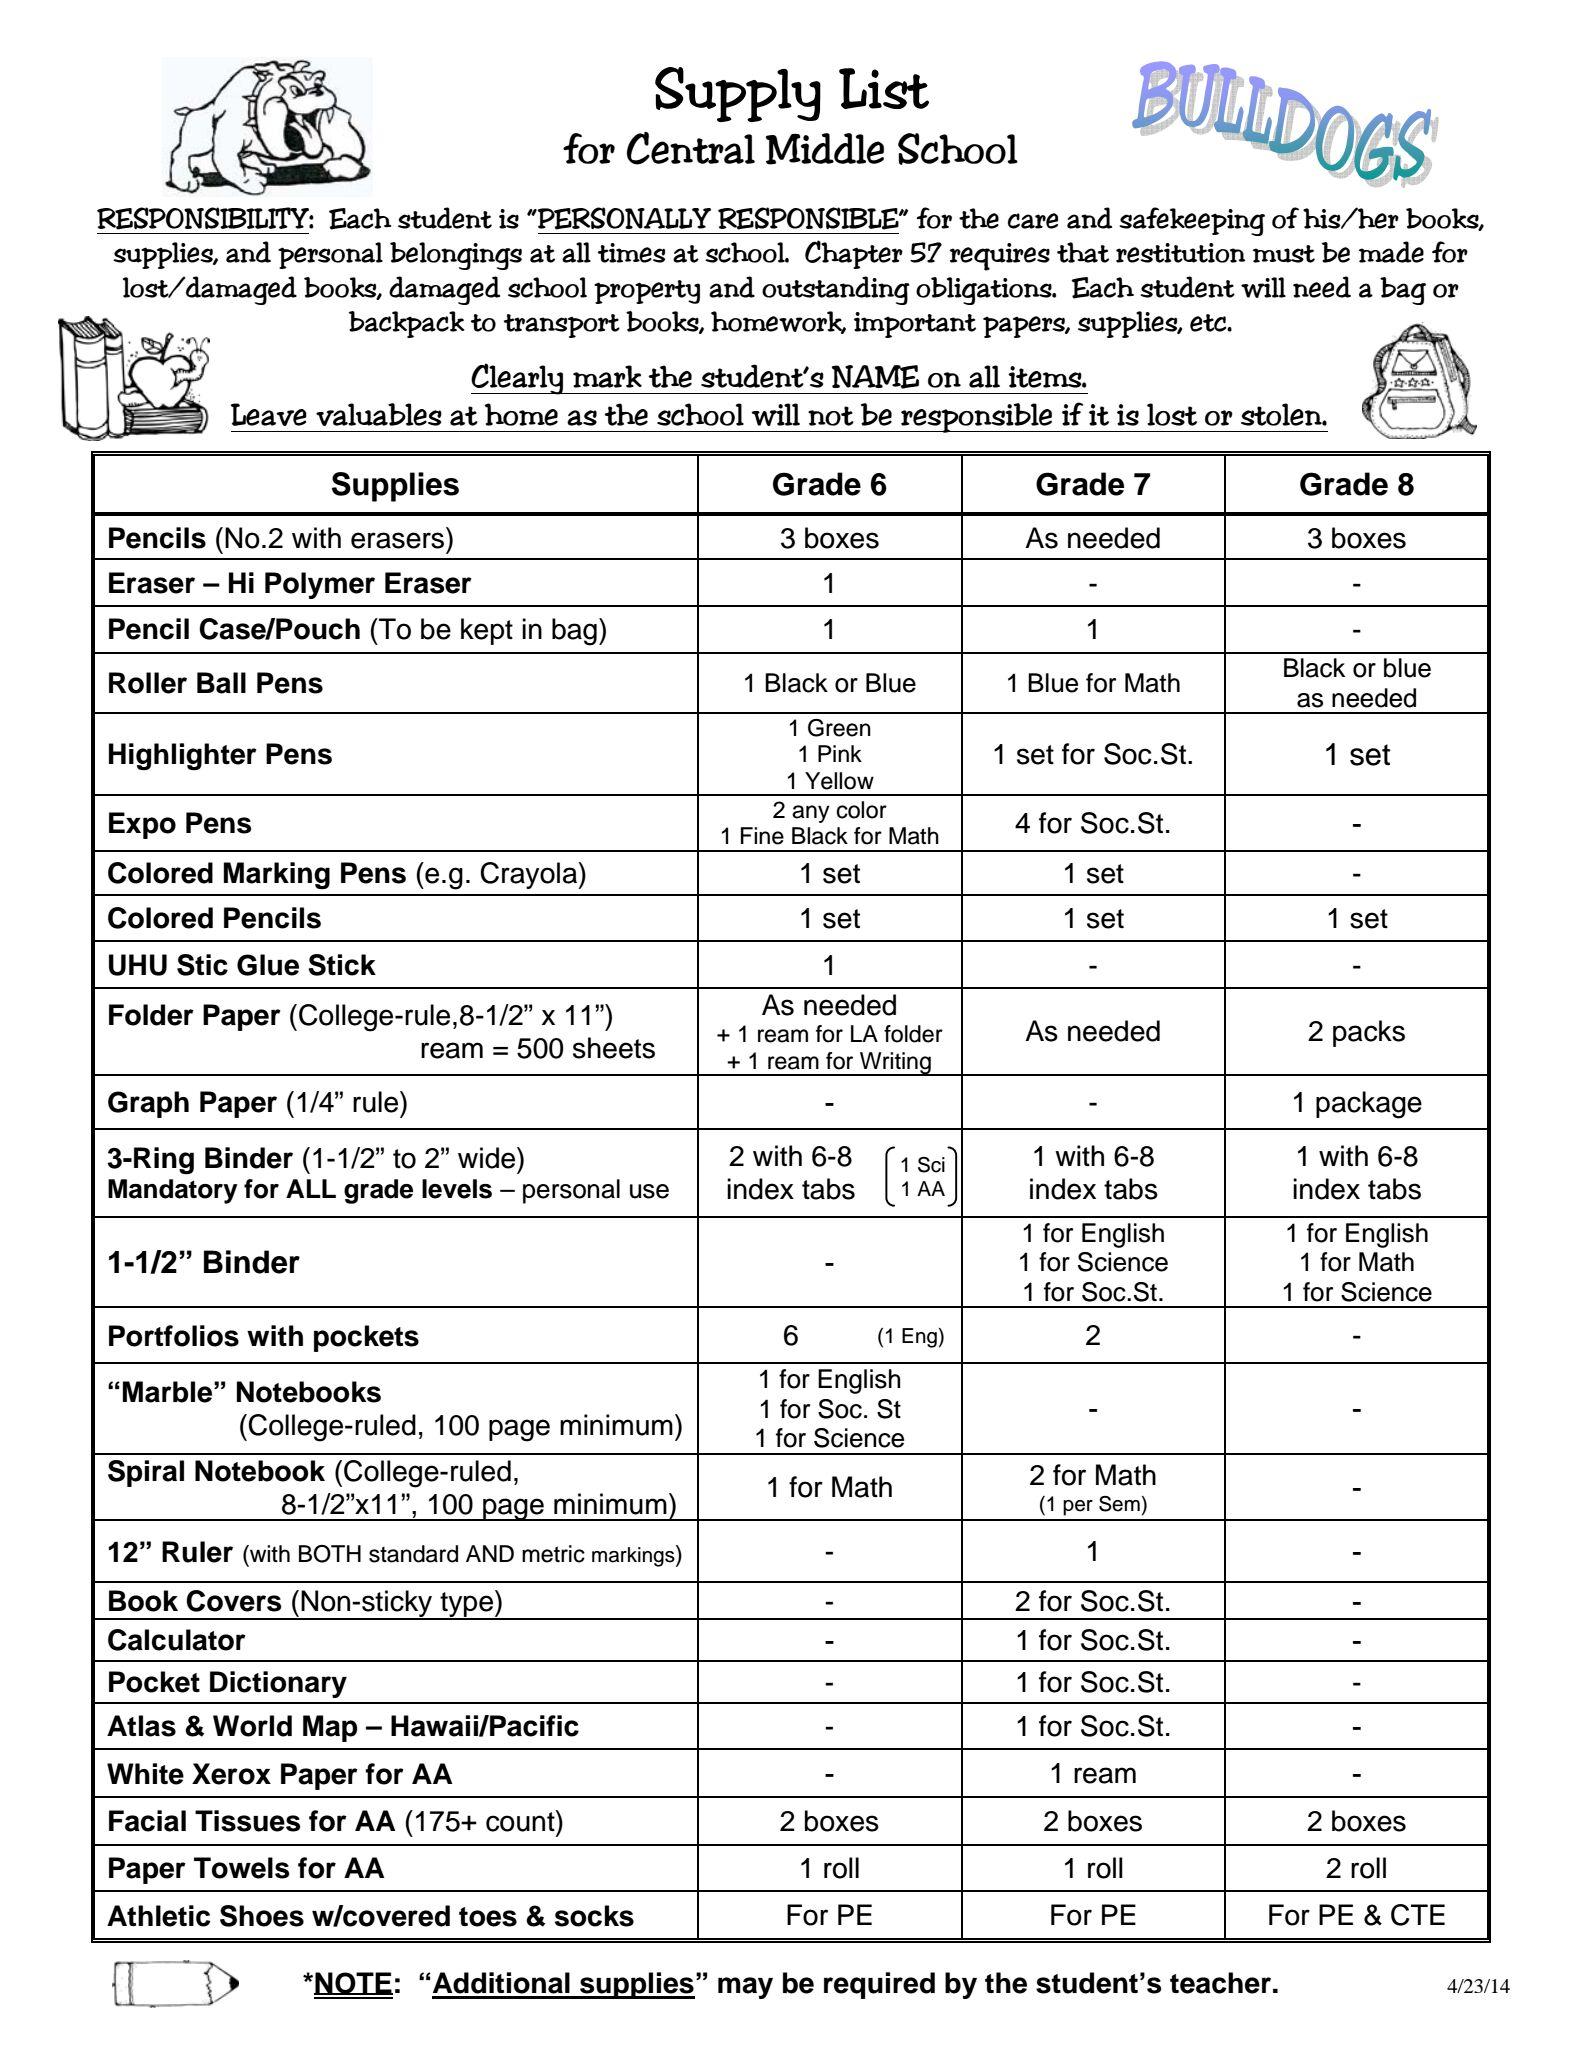 School Documents – School Community Council – Central Middle